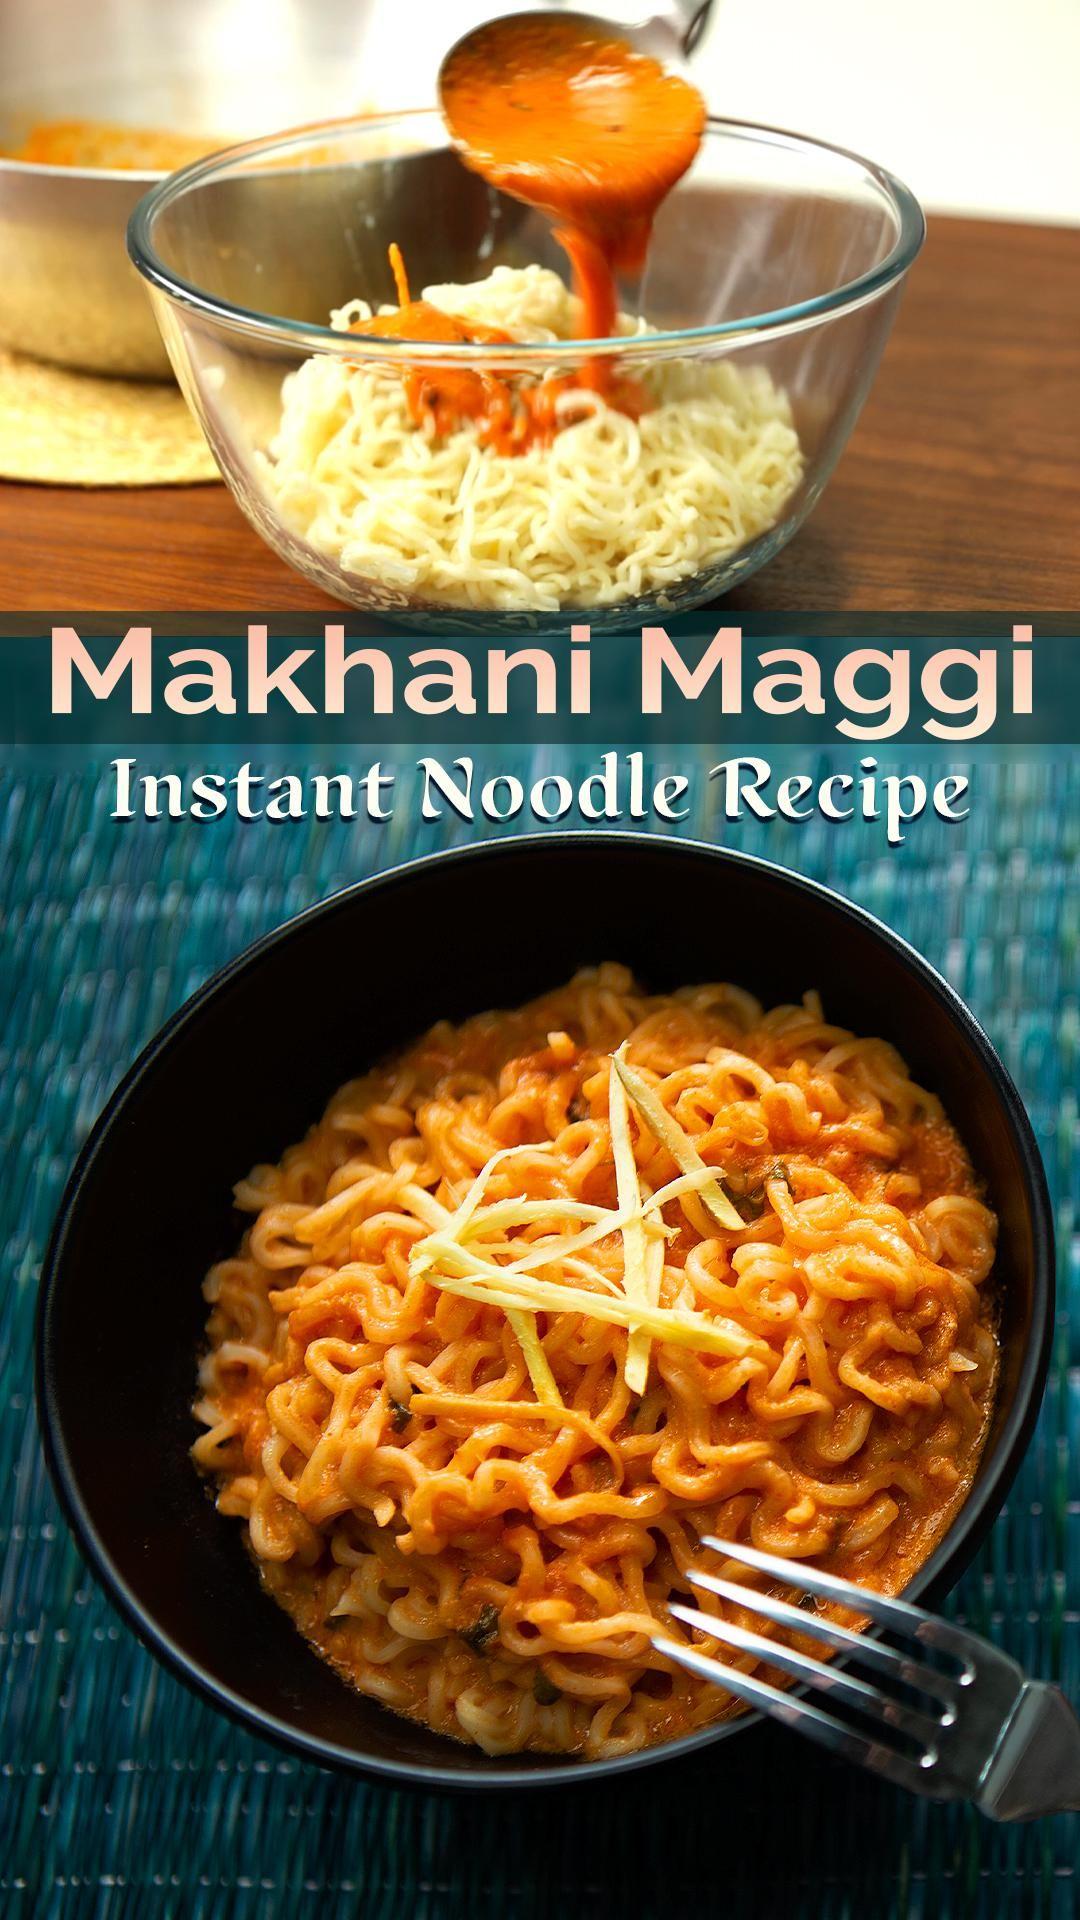 Tasty Makhani Maggi   How to make the best Makhani Maggi Noodles